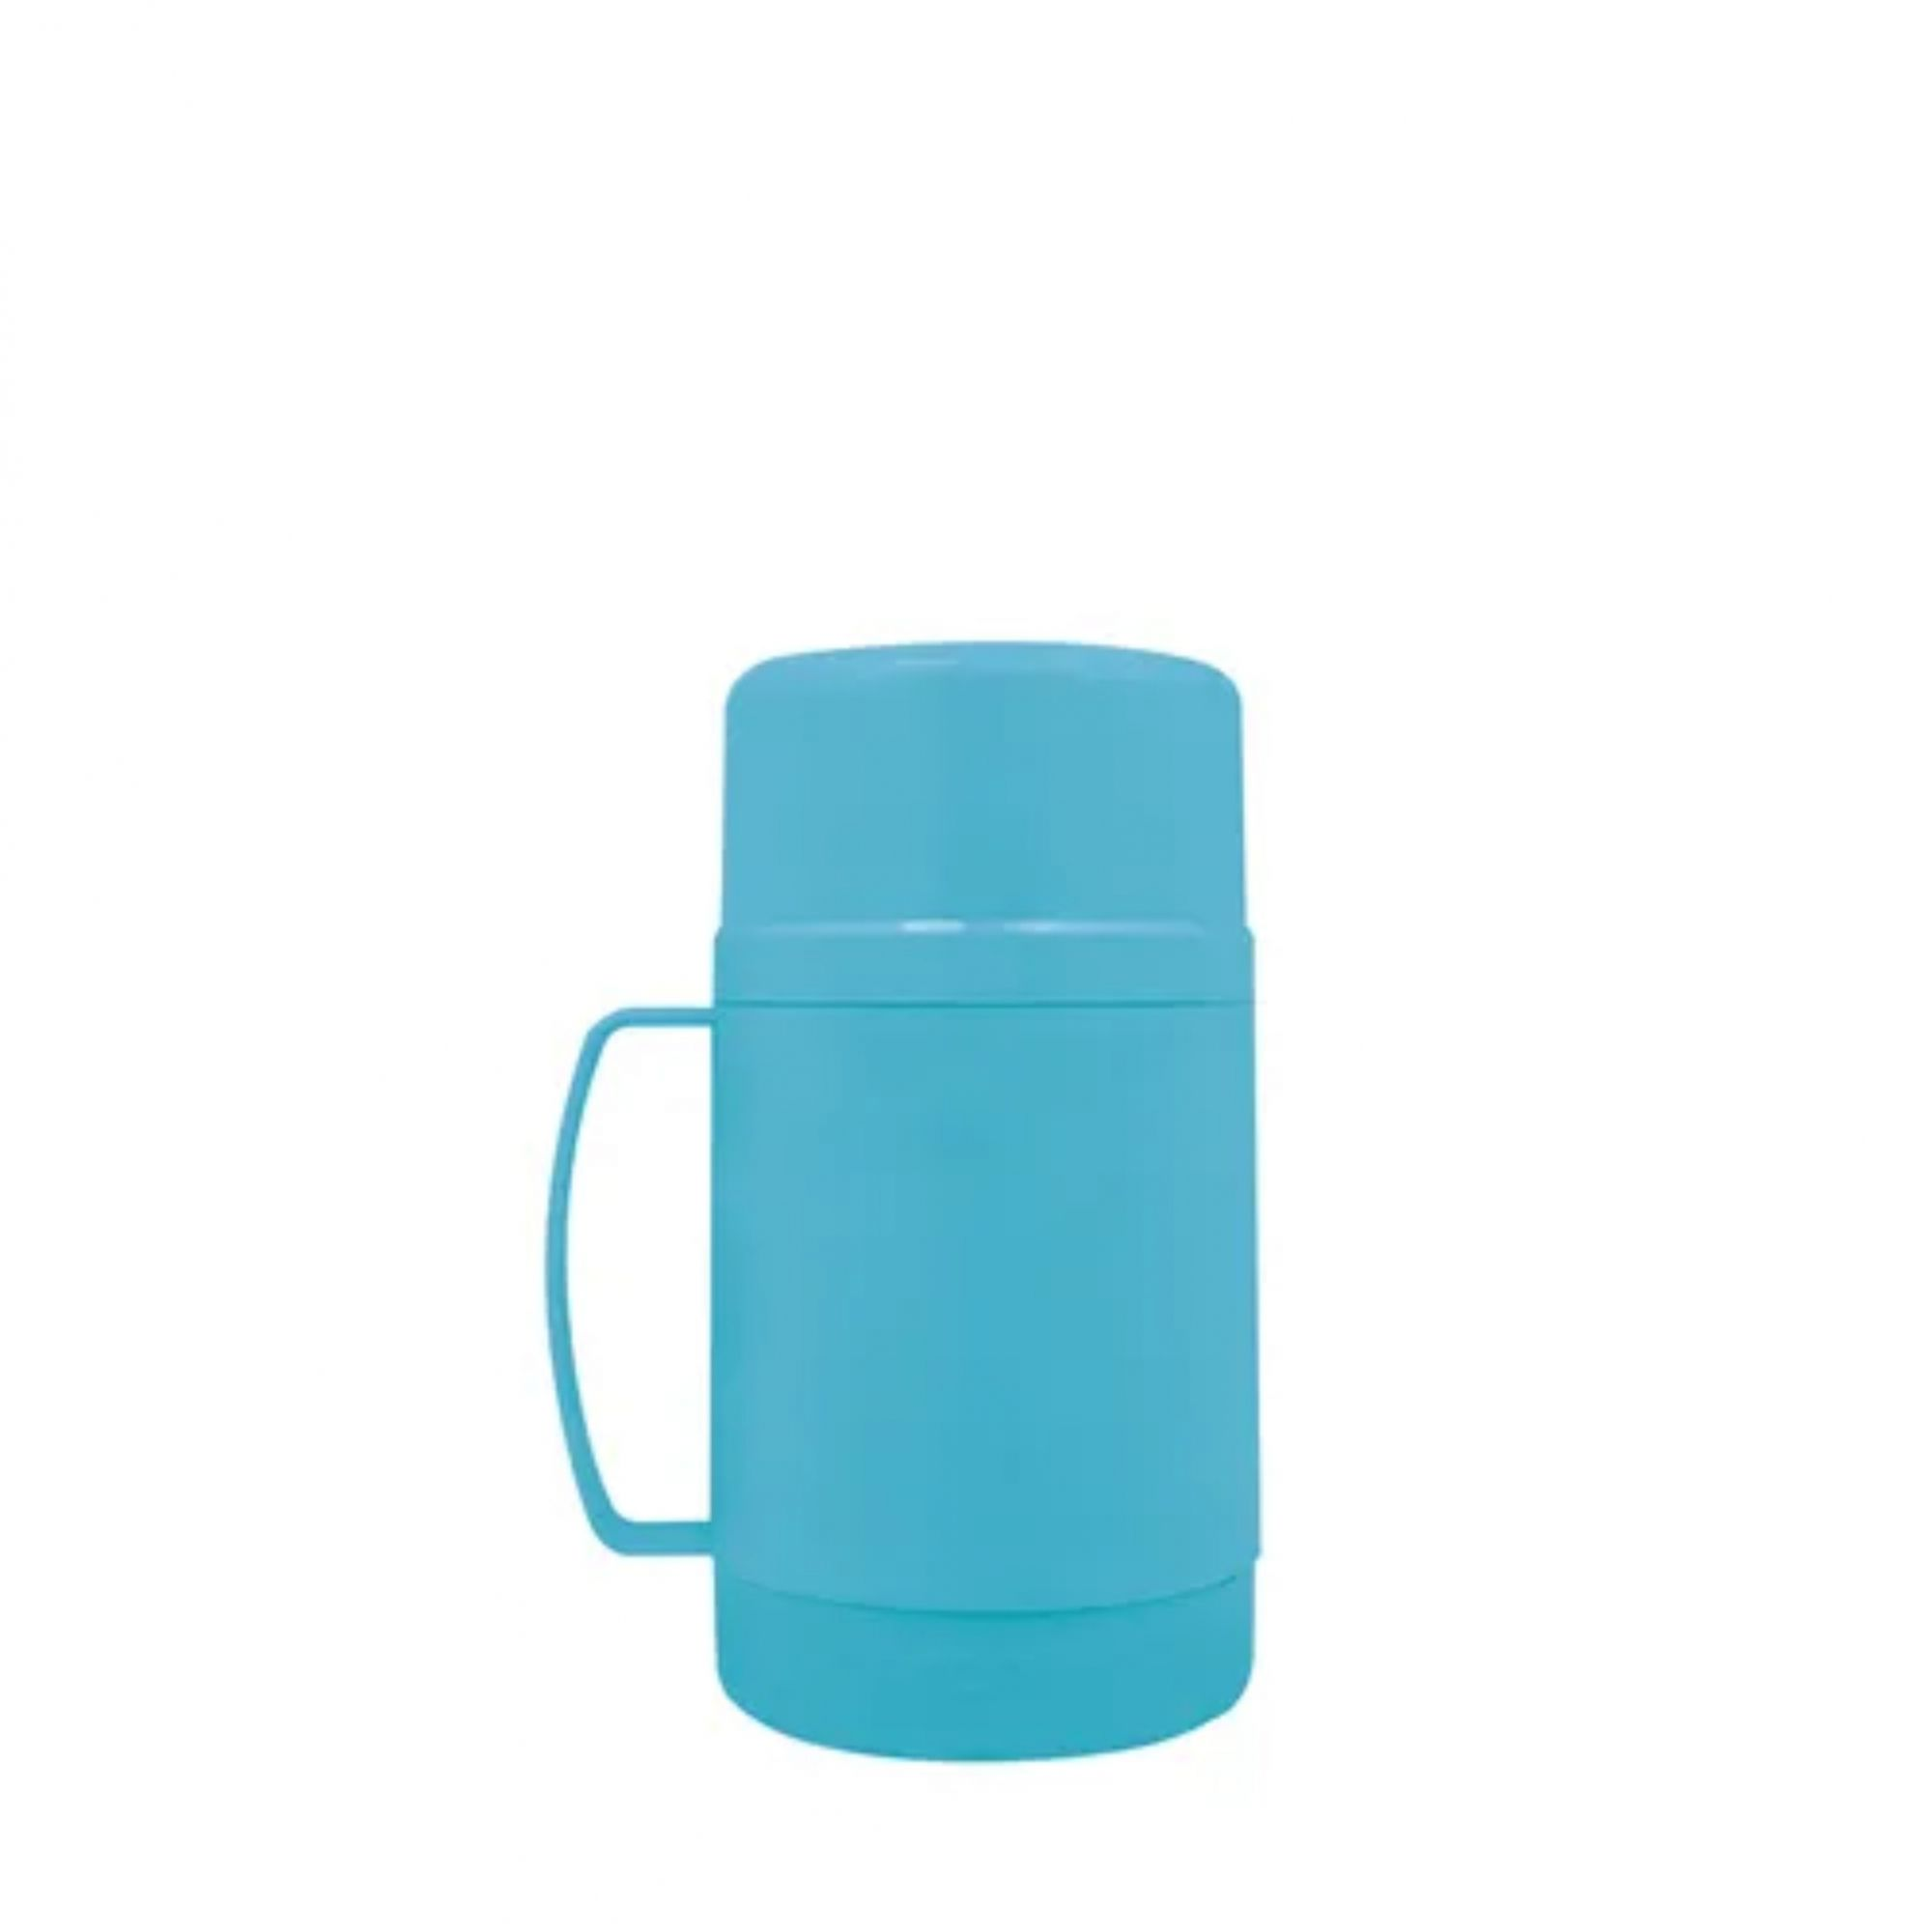 Garrafa Térmica Indie 500ml Céu Azul - Mor  - Pensou Filtros